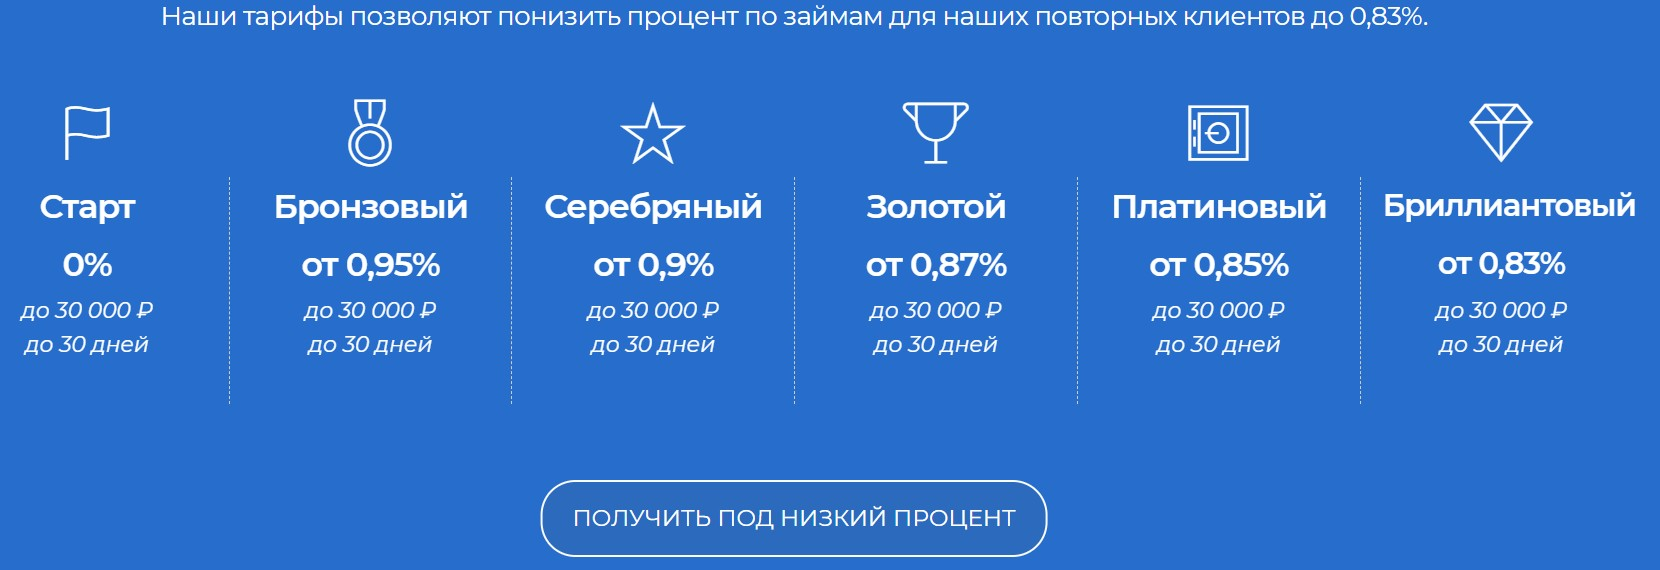 Займ без отказа 100 процентов на карту: тарифы МФО Вебзайм